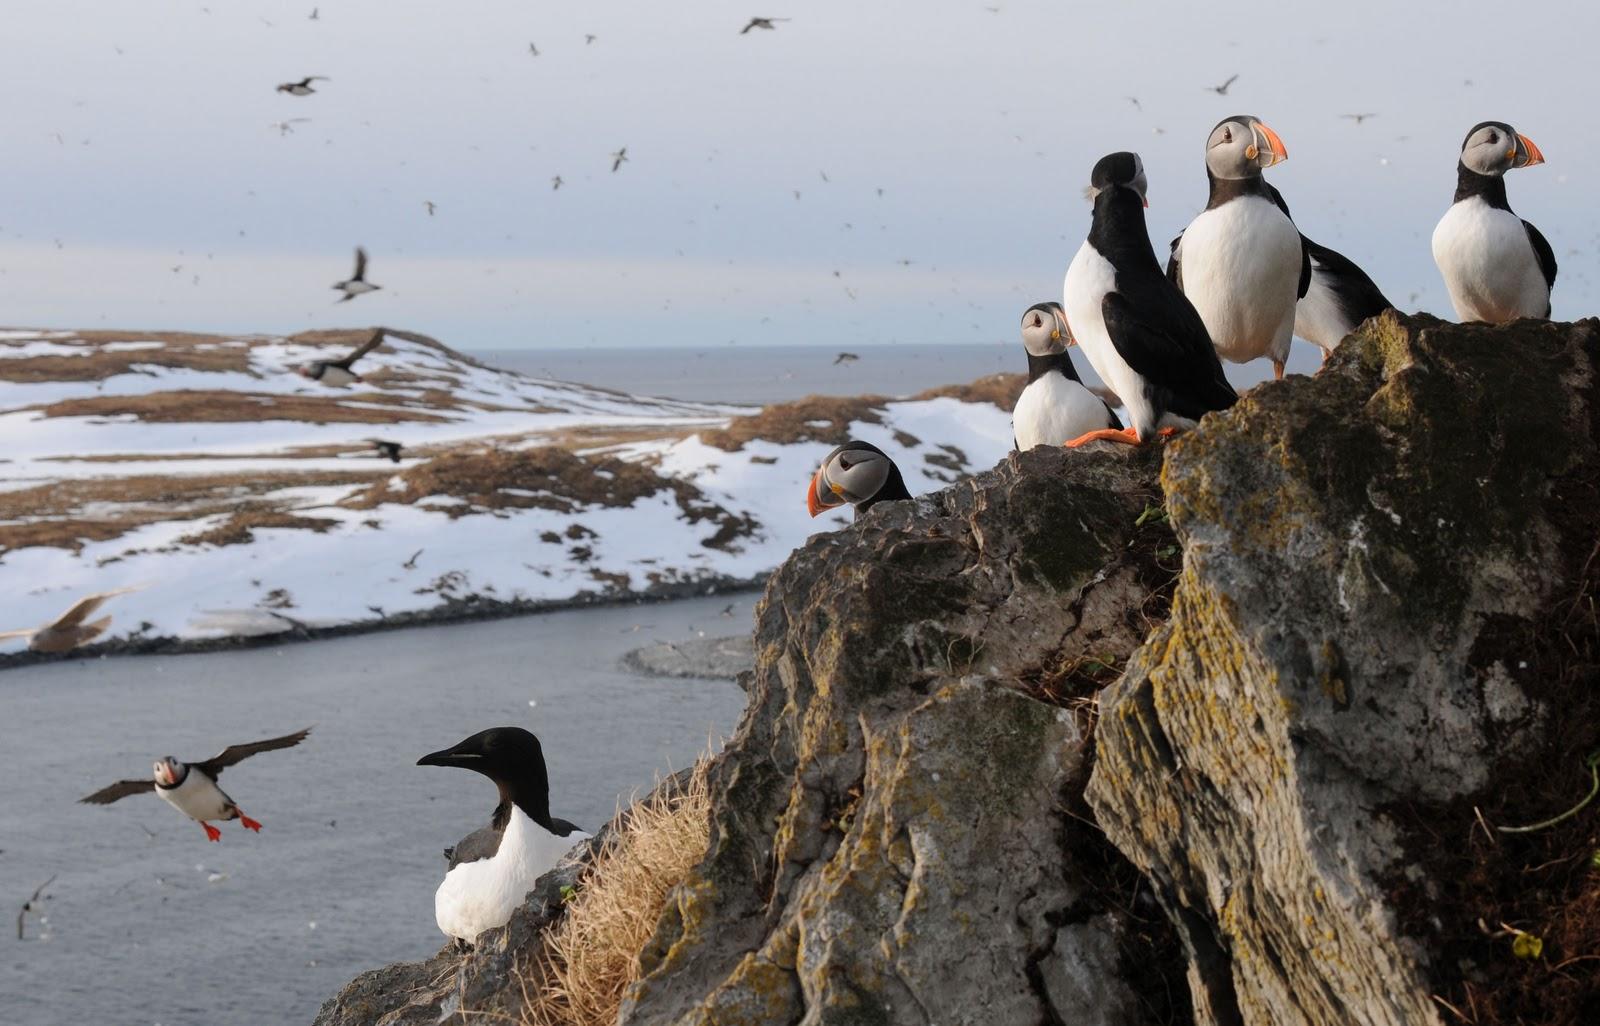 птахи арктики фото резонный, нам самим